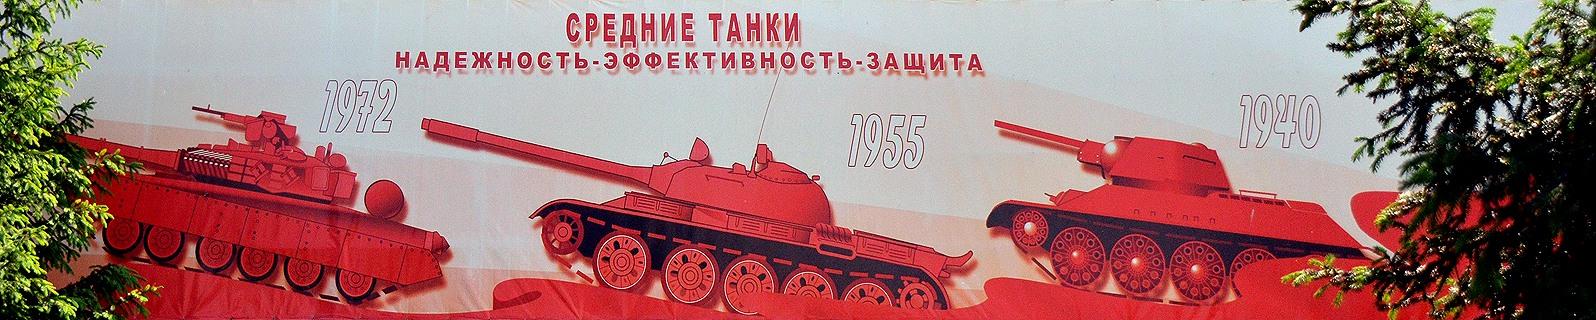 9836s_2.jpg - Бронетанковый музей, Кубинка (02.06.2012)